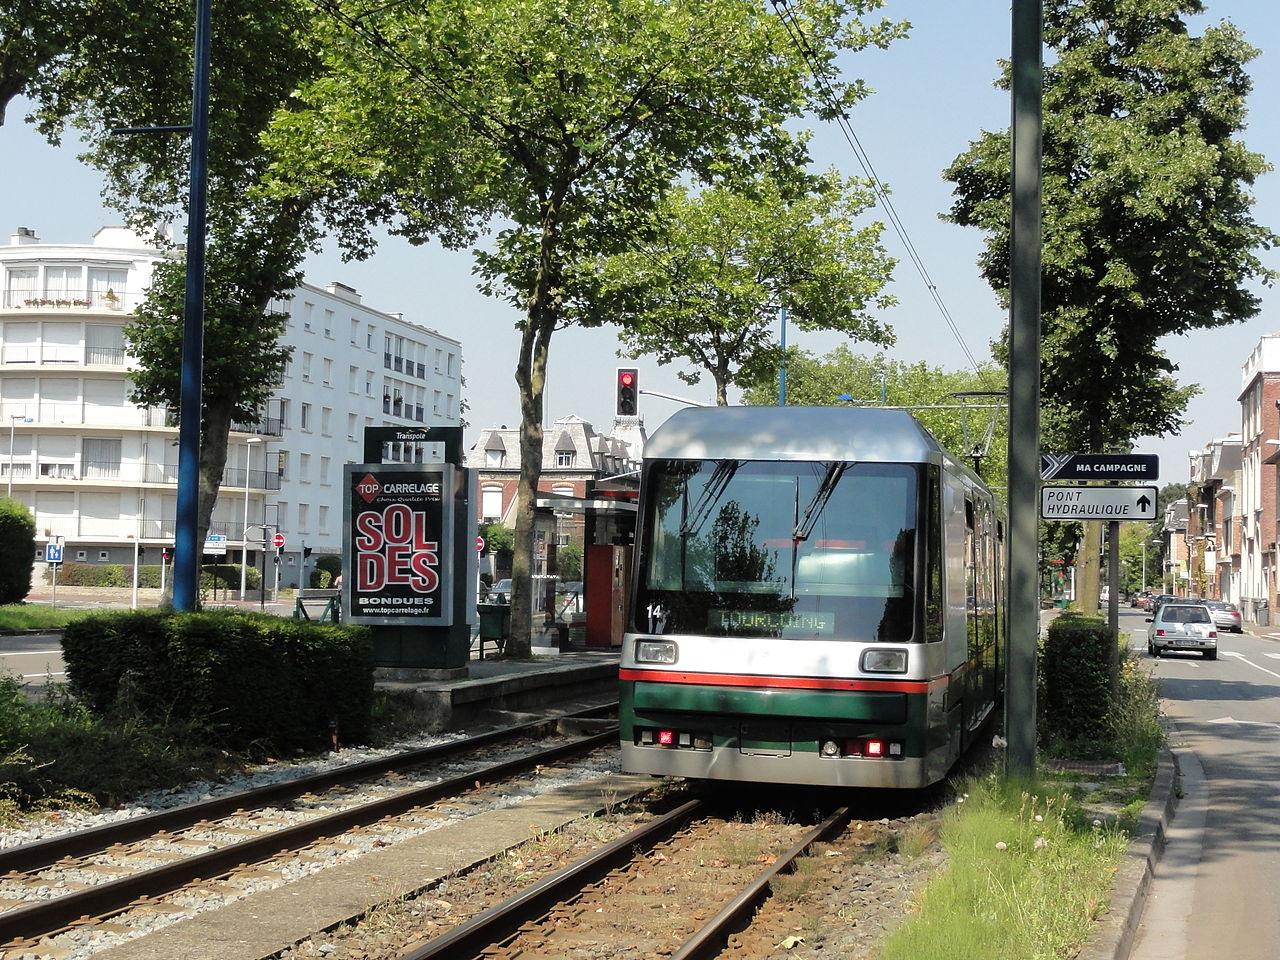 File Ligne T Du Tramway De Lille Roubaix Tourcoing 090 Jpg Wikimedia Commons